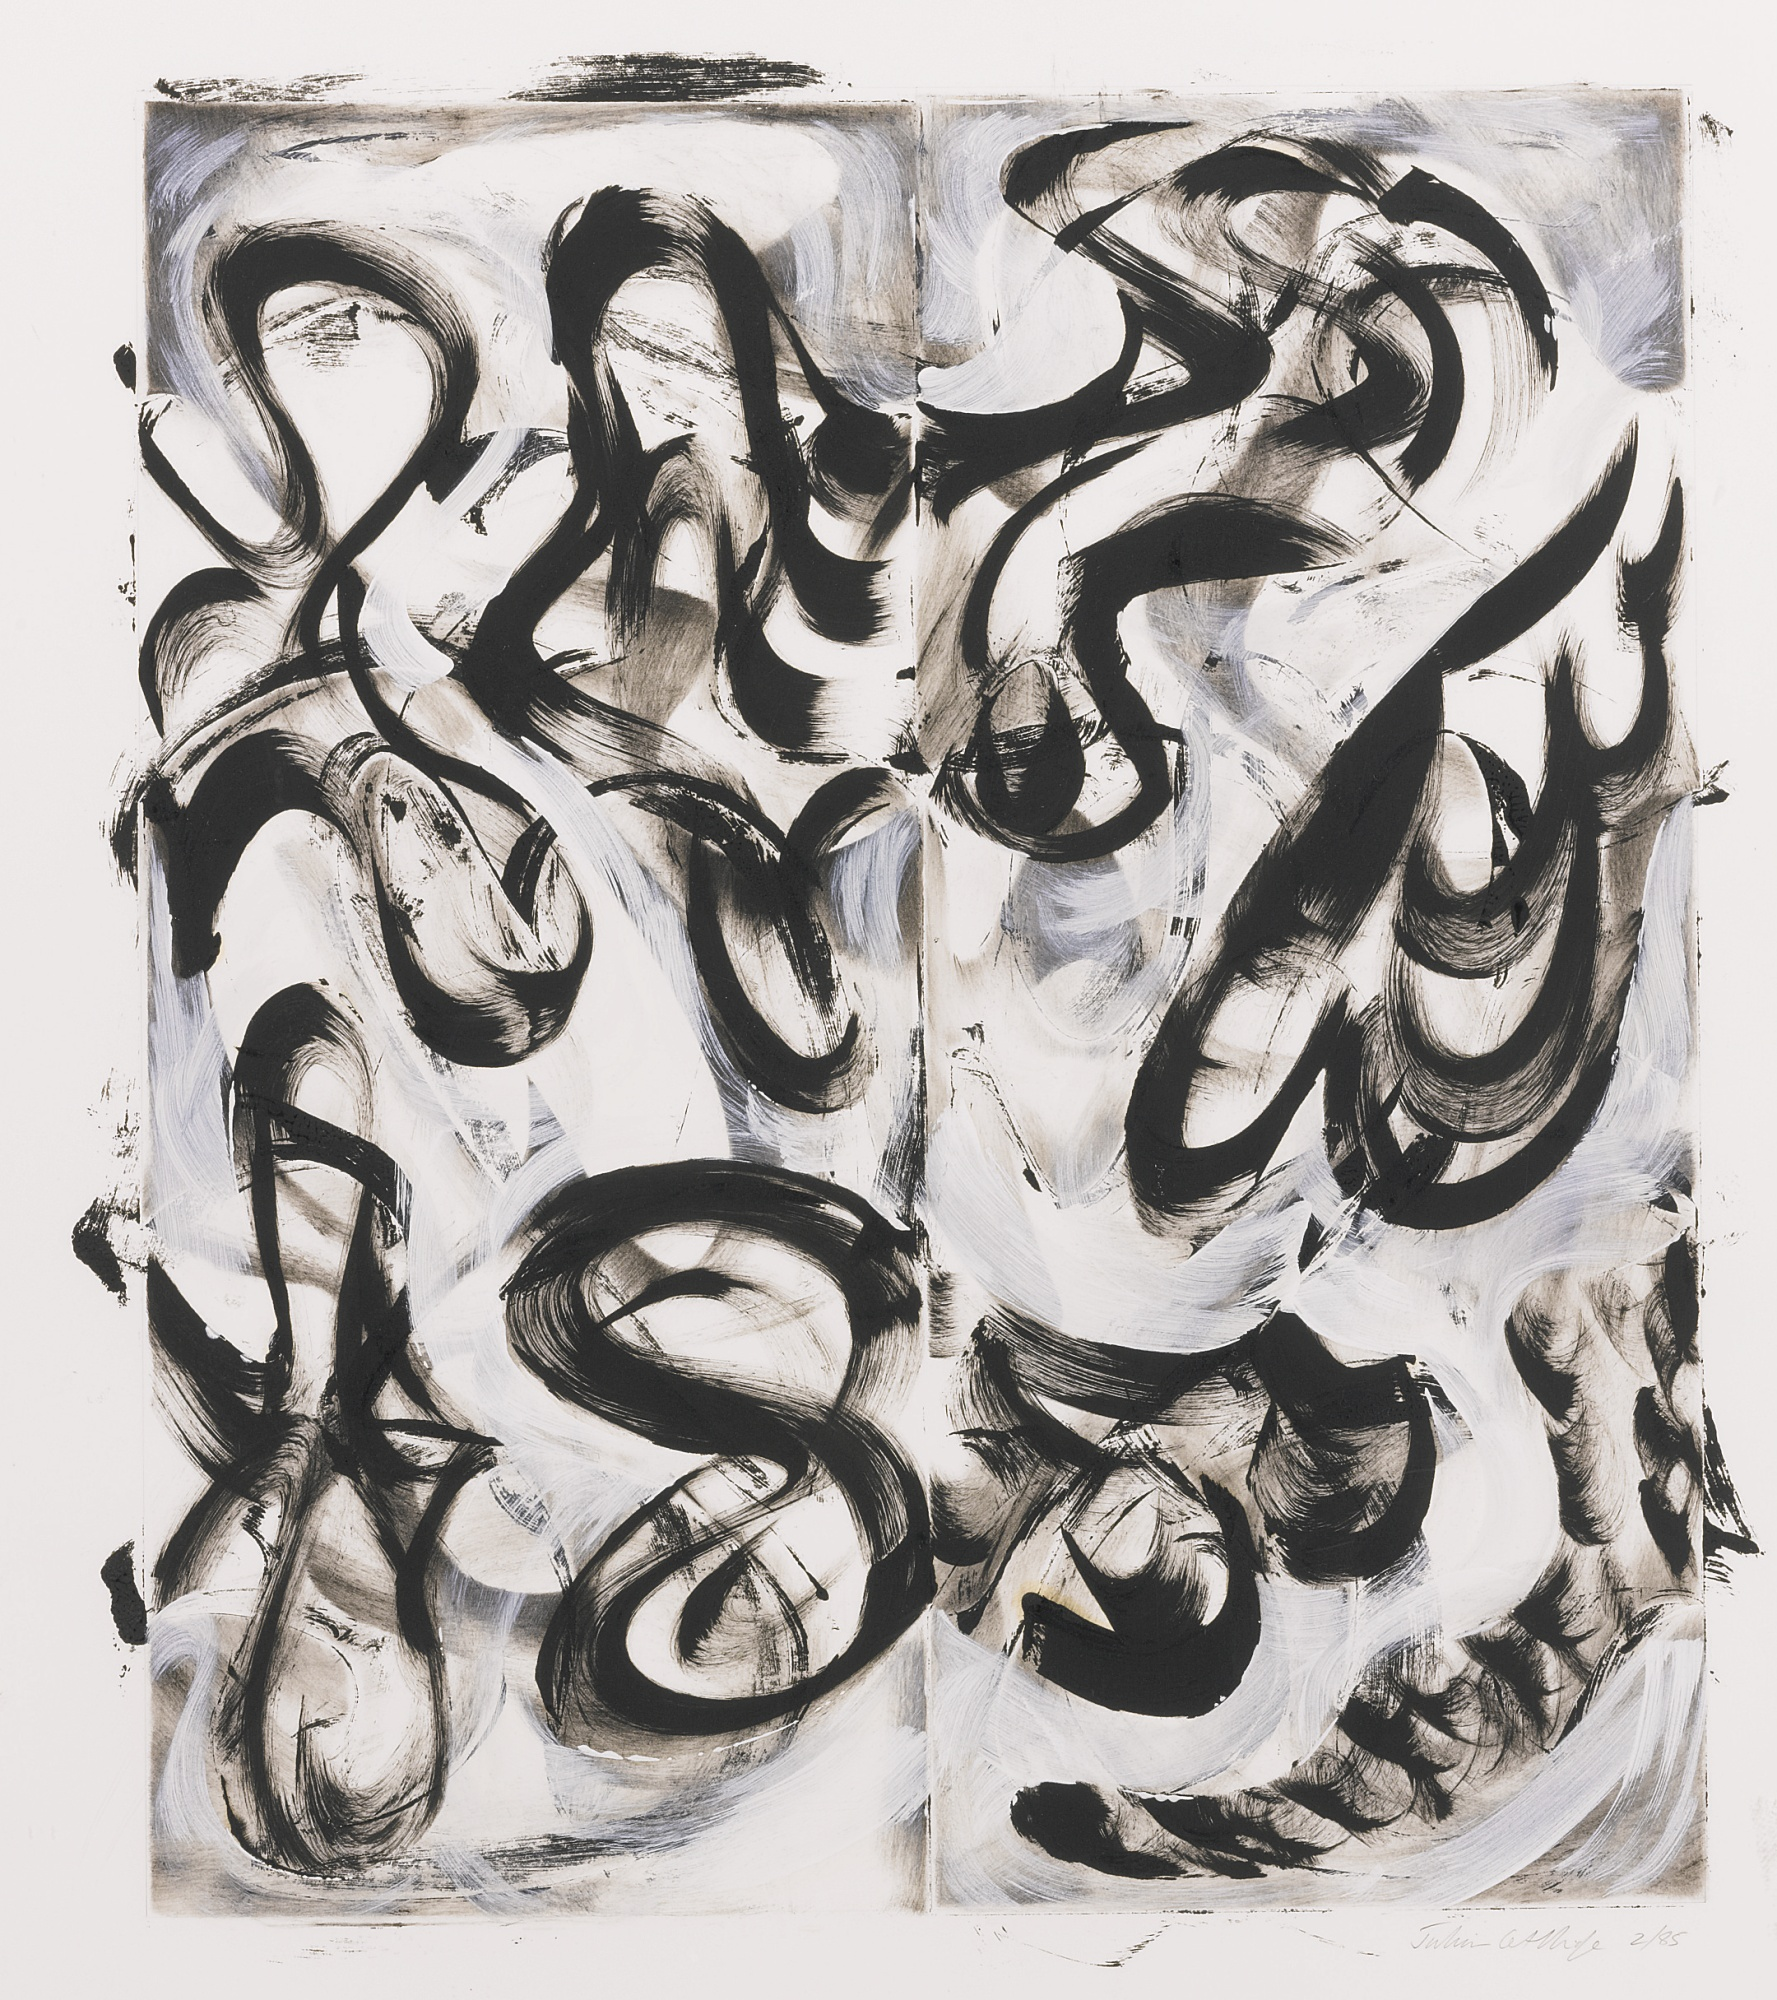 Julian Lethbridge-Untitled (Abstract)-1985